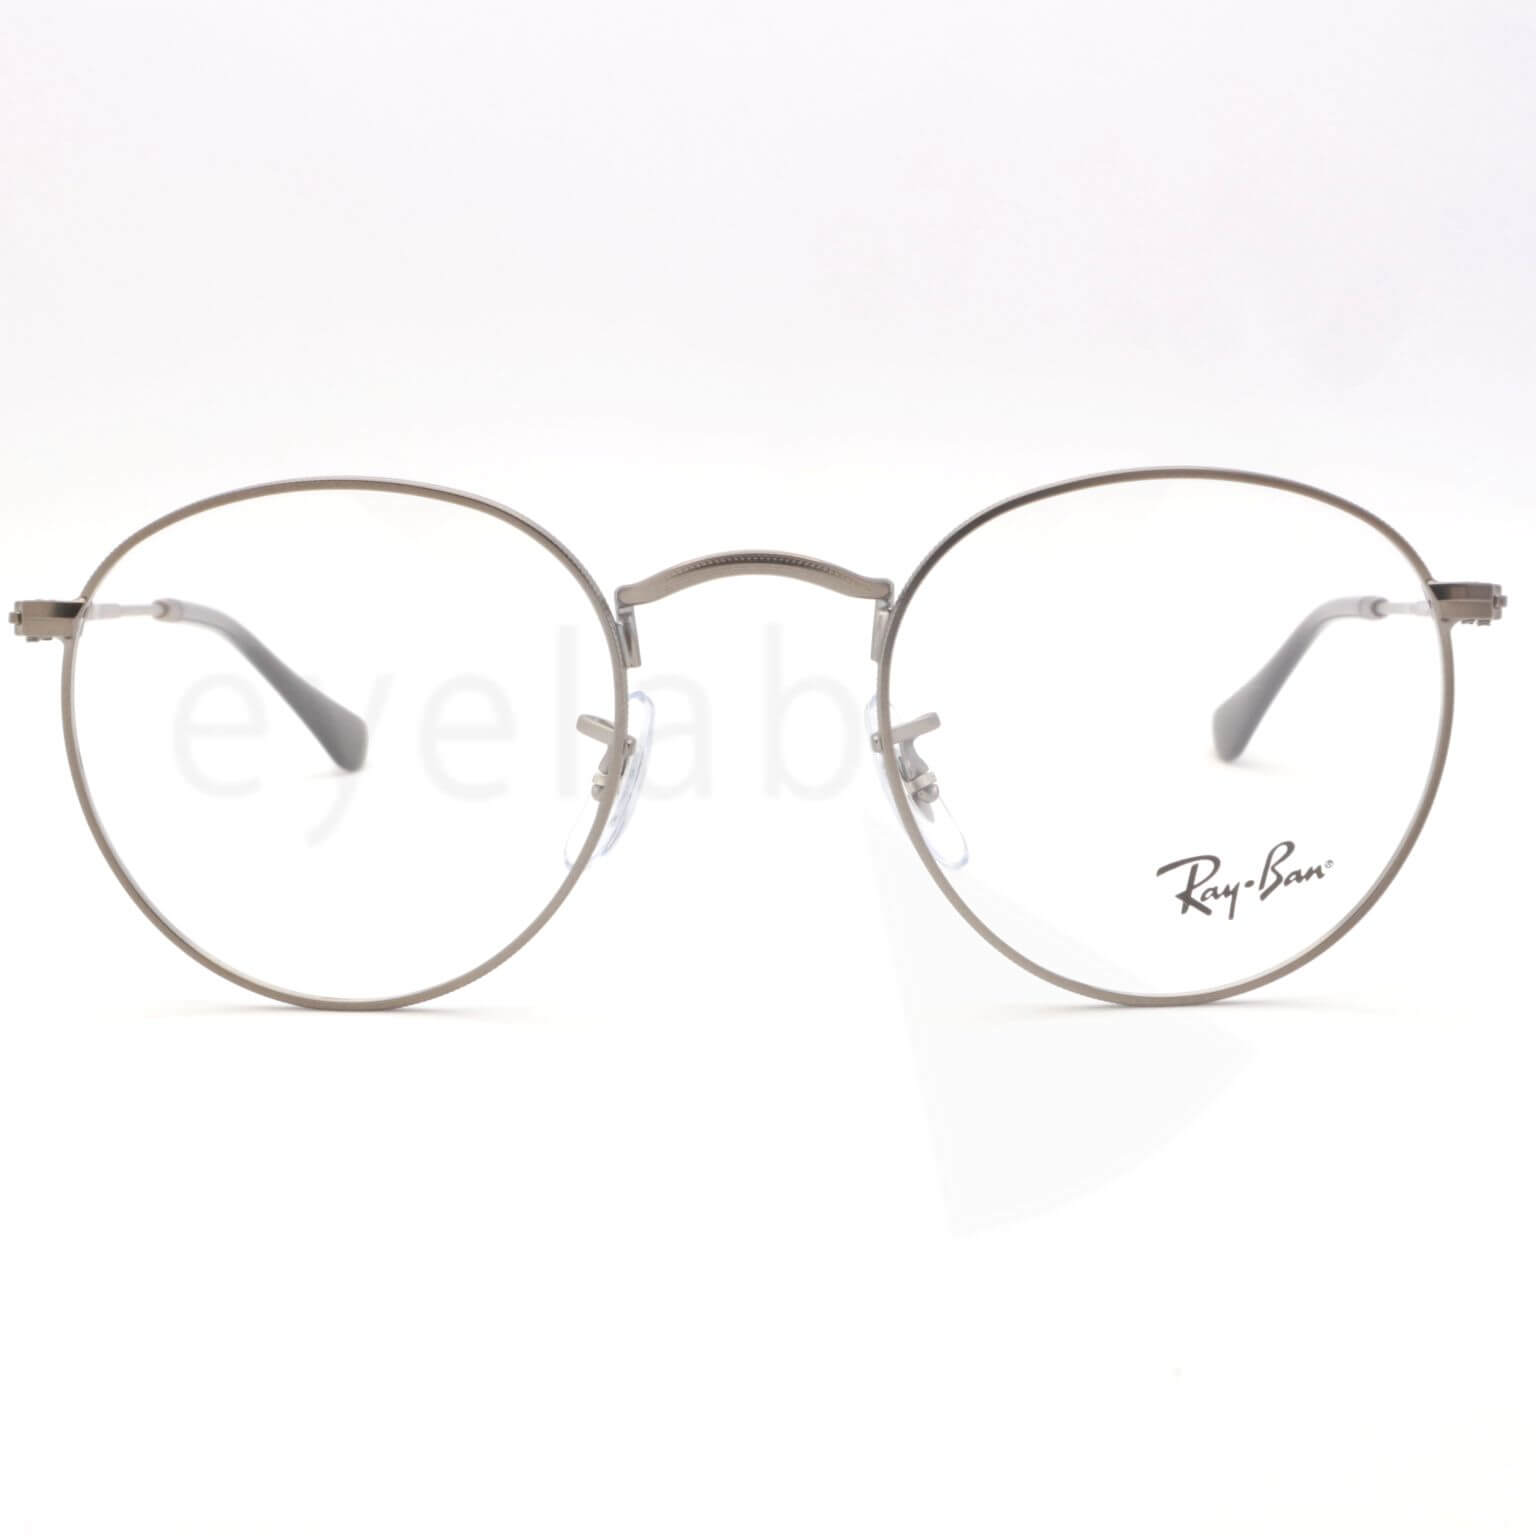 cdcecde73c Γυαλιά οράσεως Ray-Ban Round Metal 3447V 2620